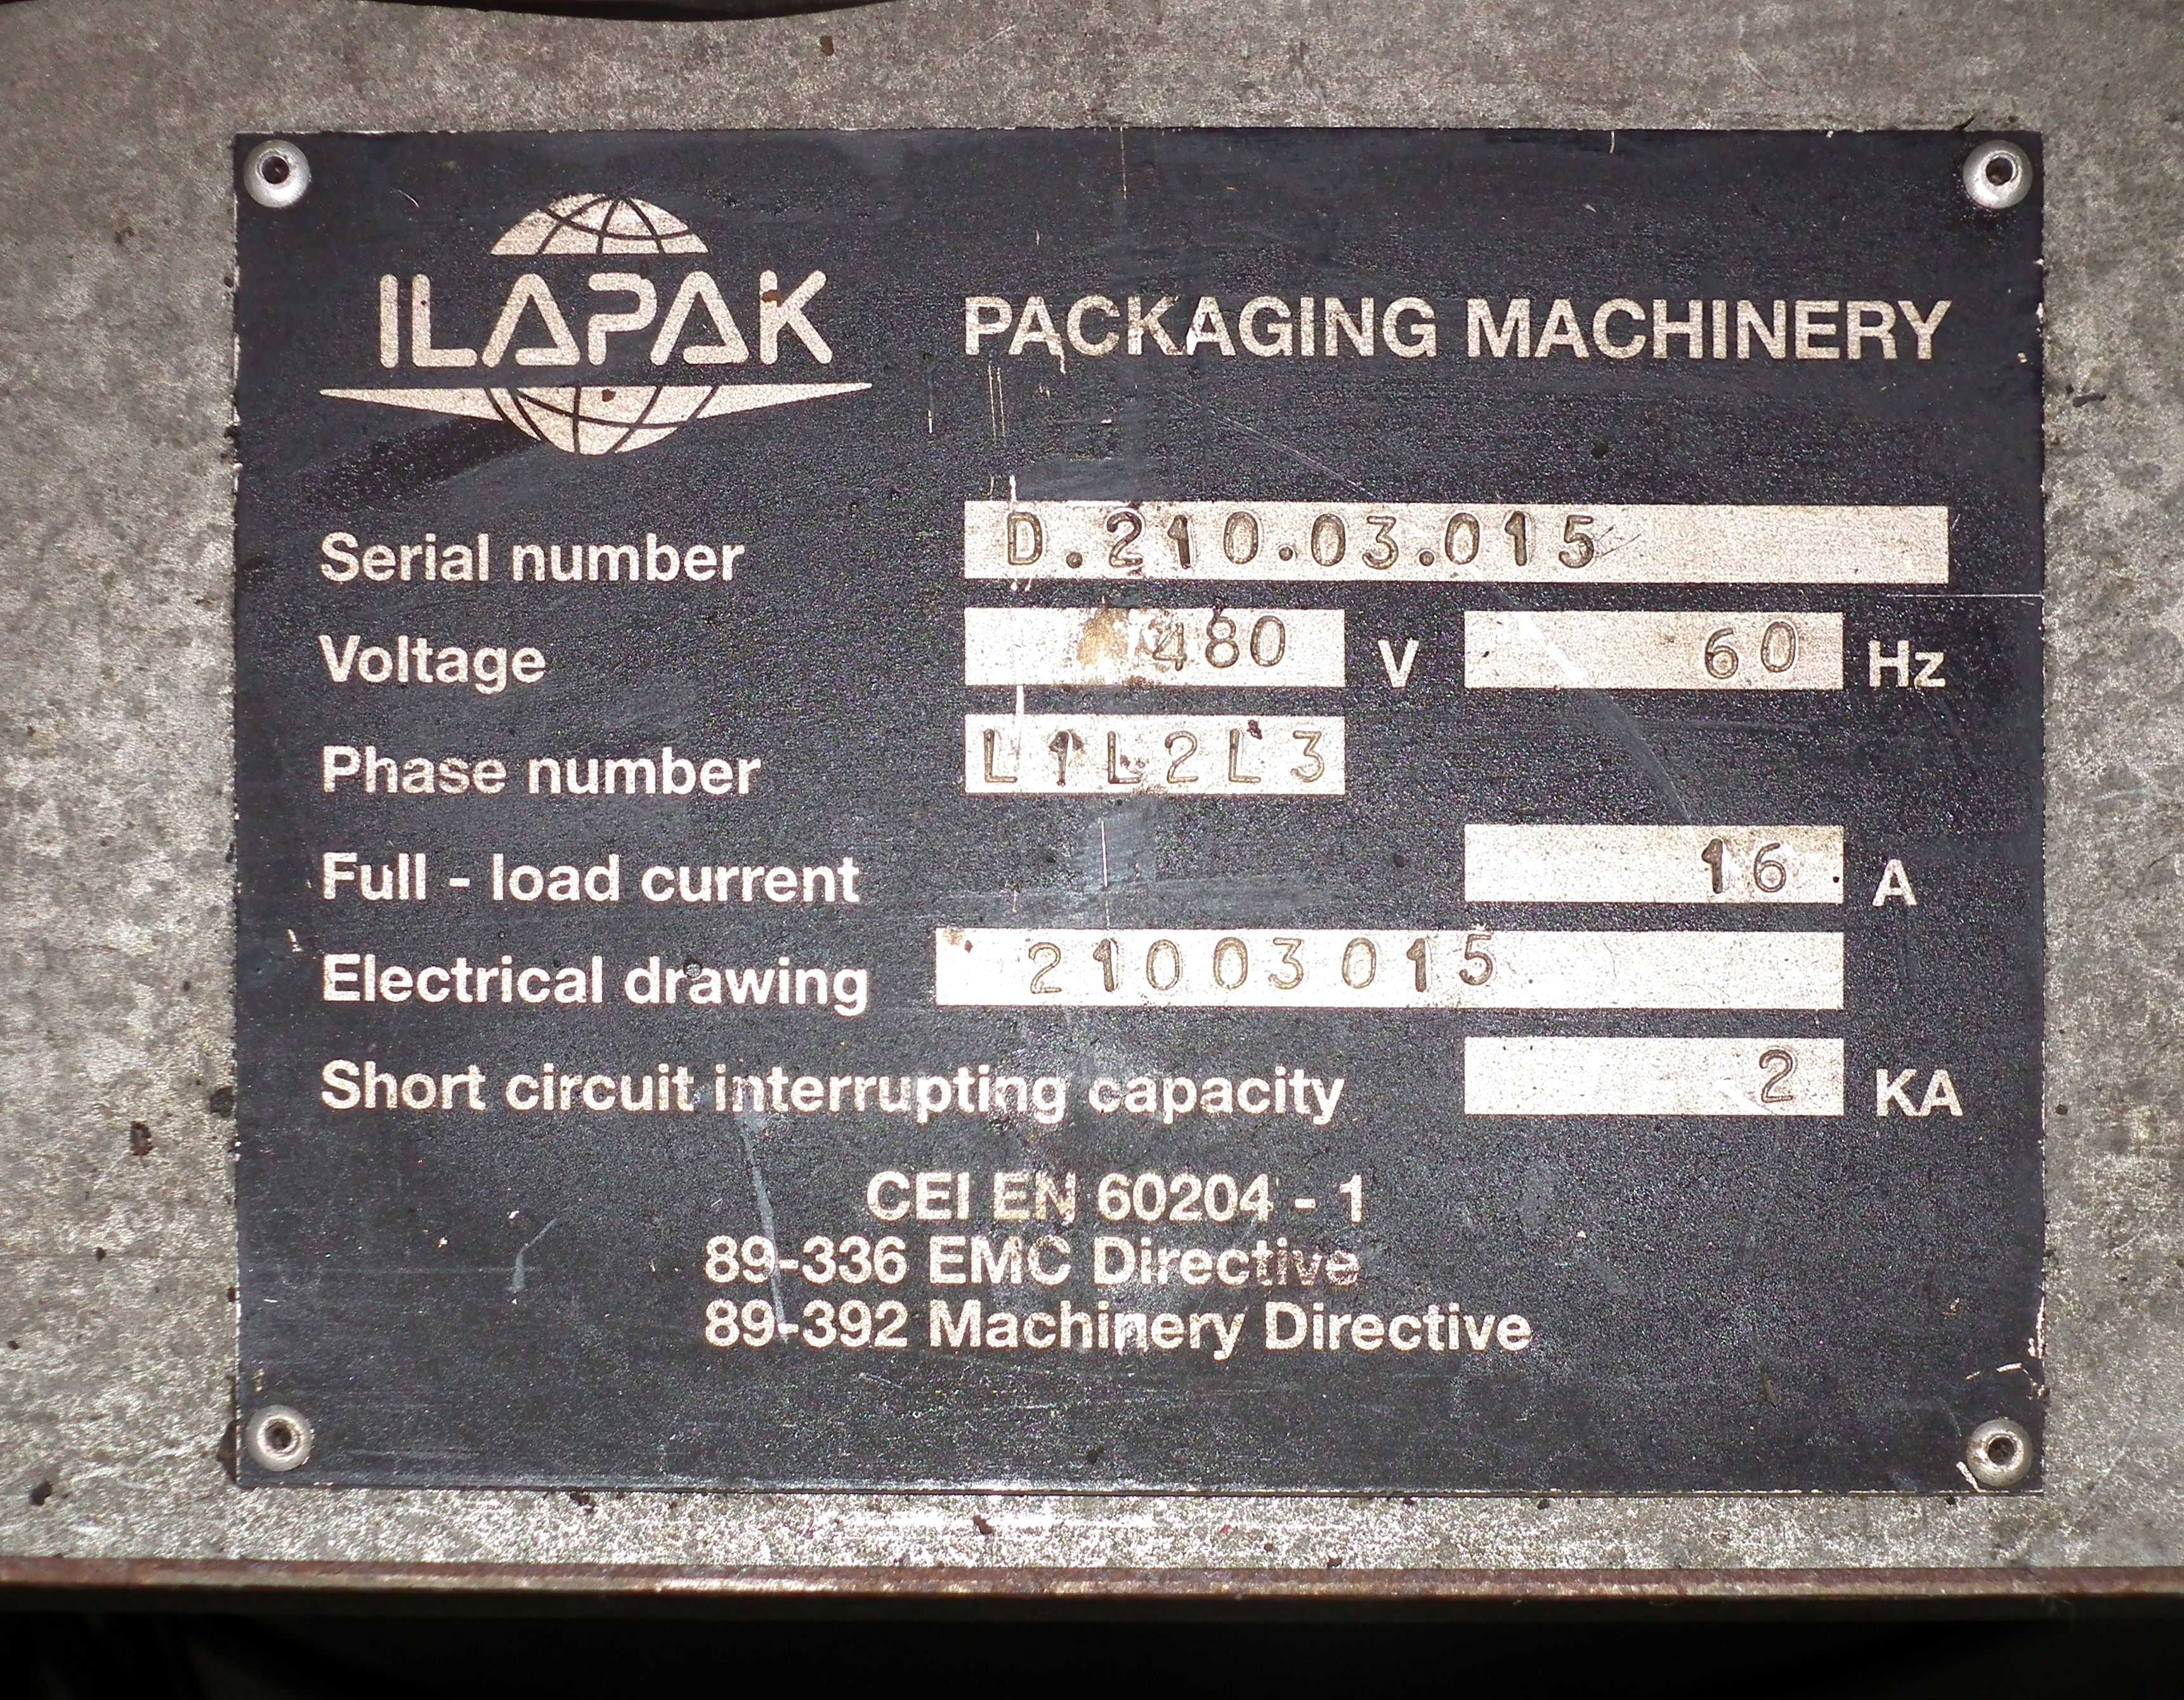 Ilapak Delta 3000 DC Wrapper B4827 - Image 13 of 13